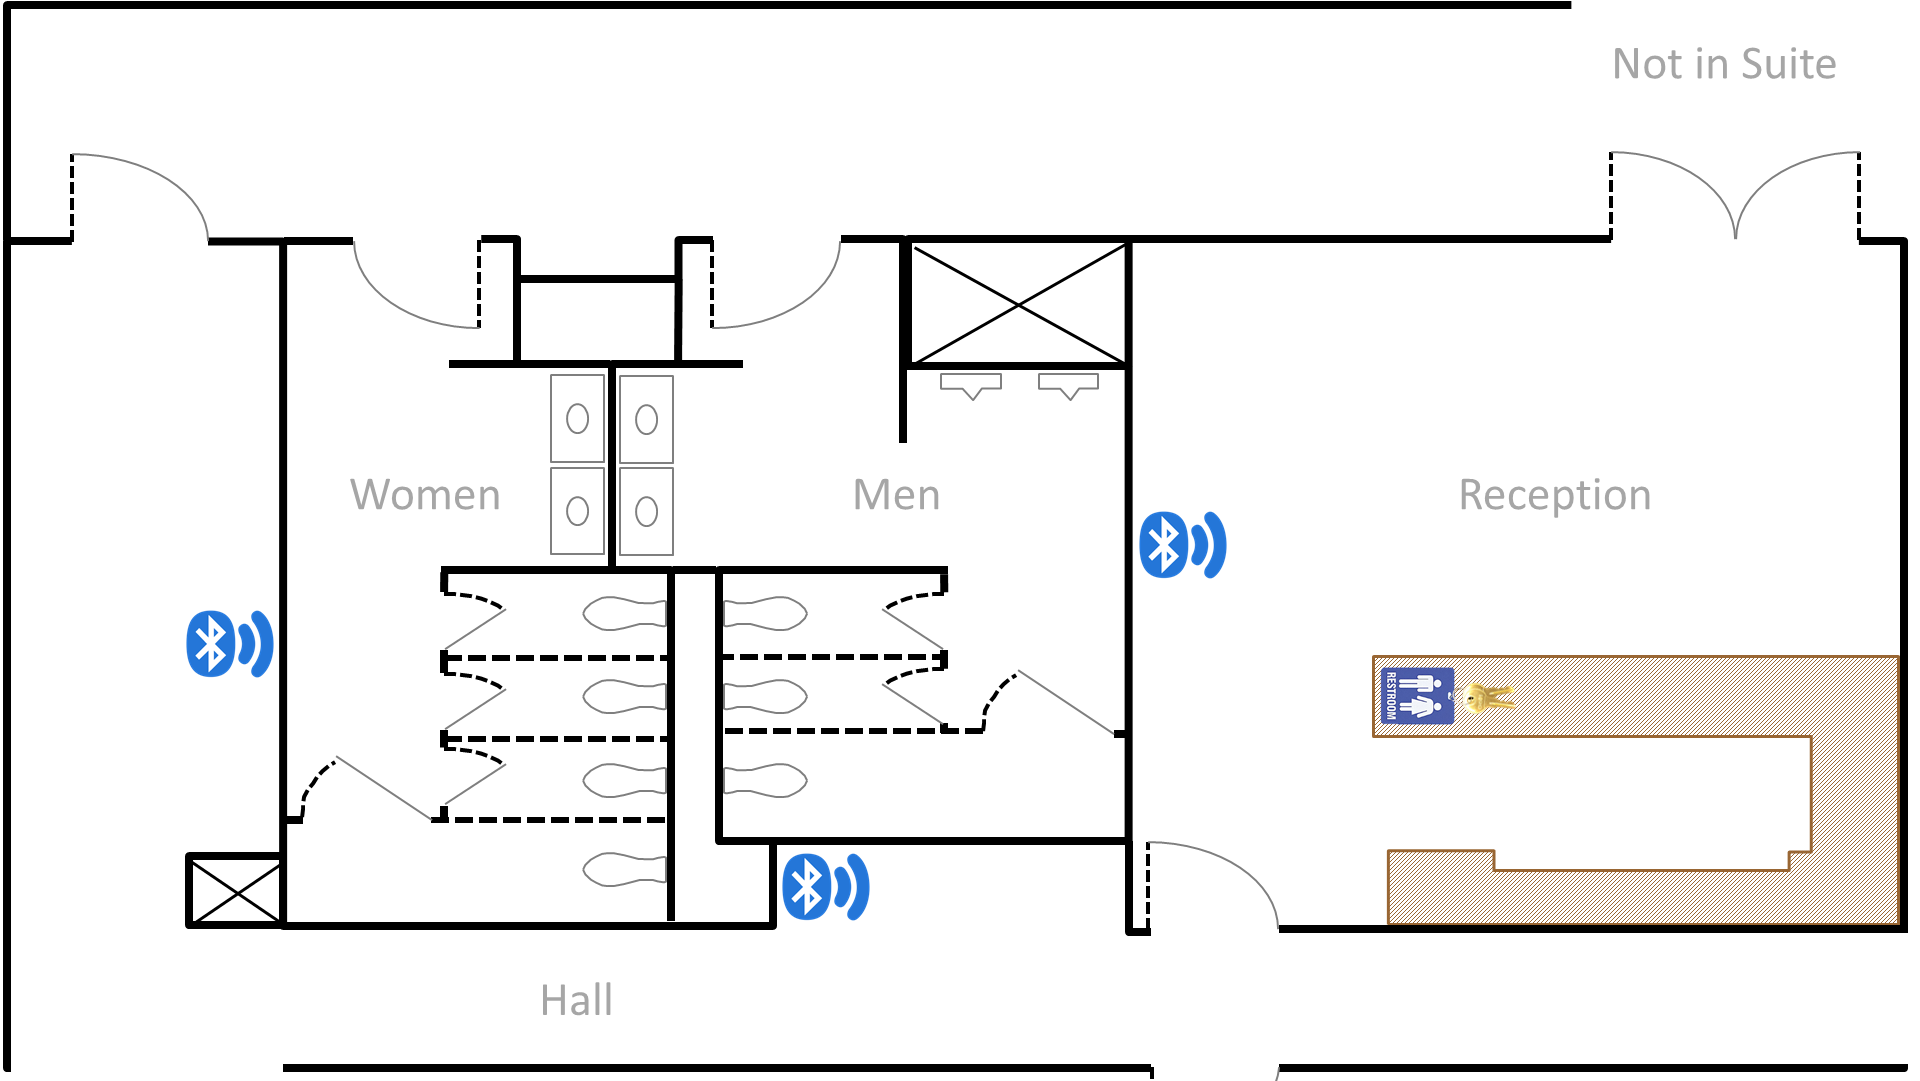 circuitpython_Restroom_Key_14.png